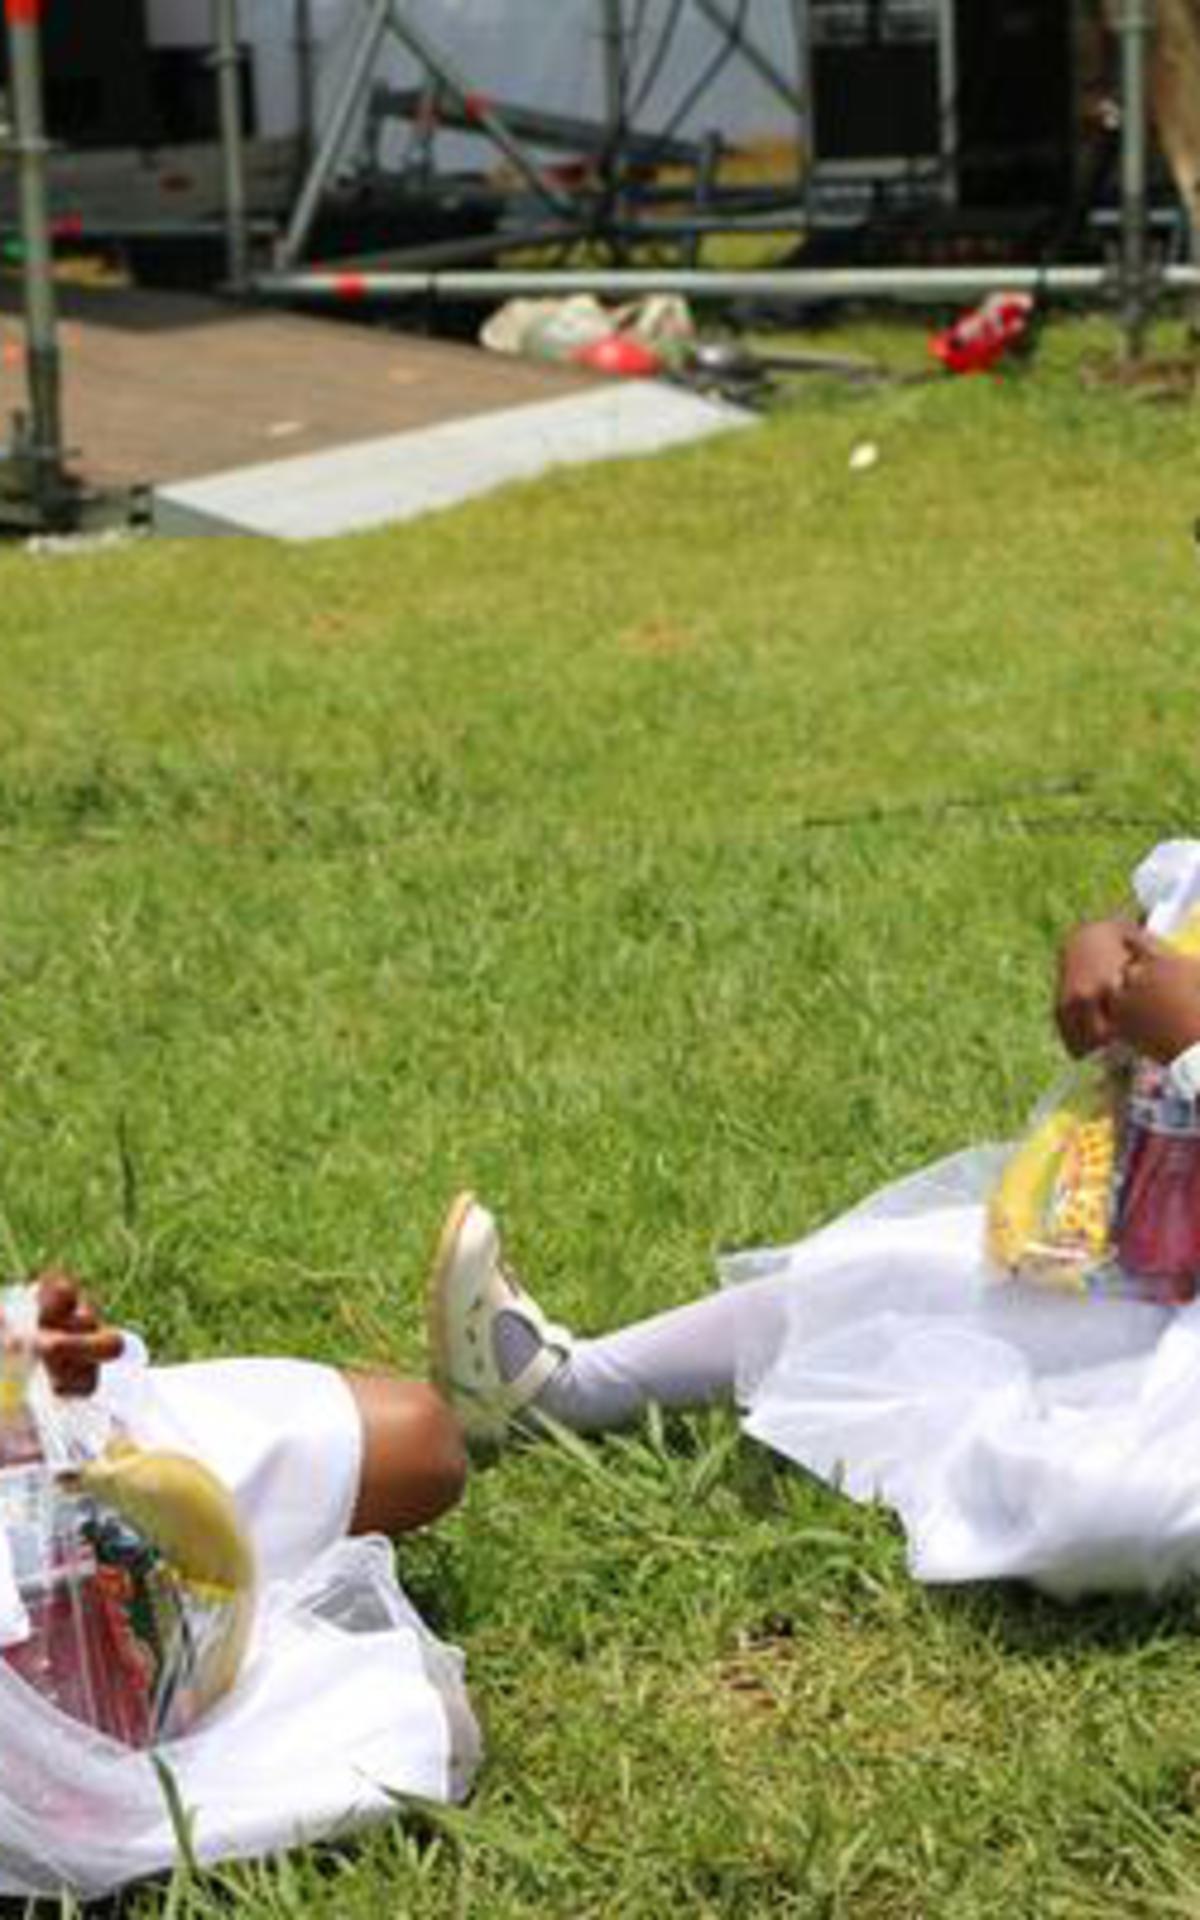 Primary girls resting